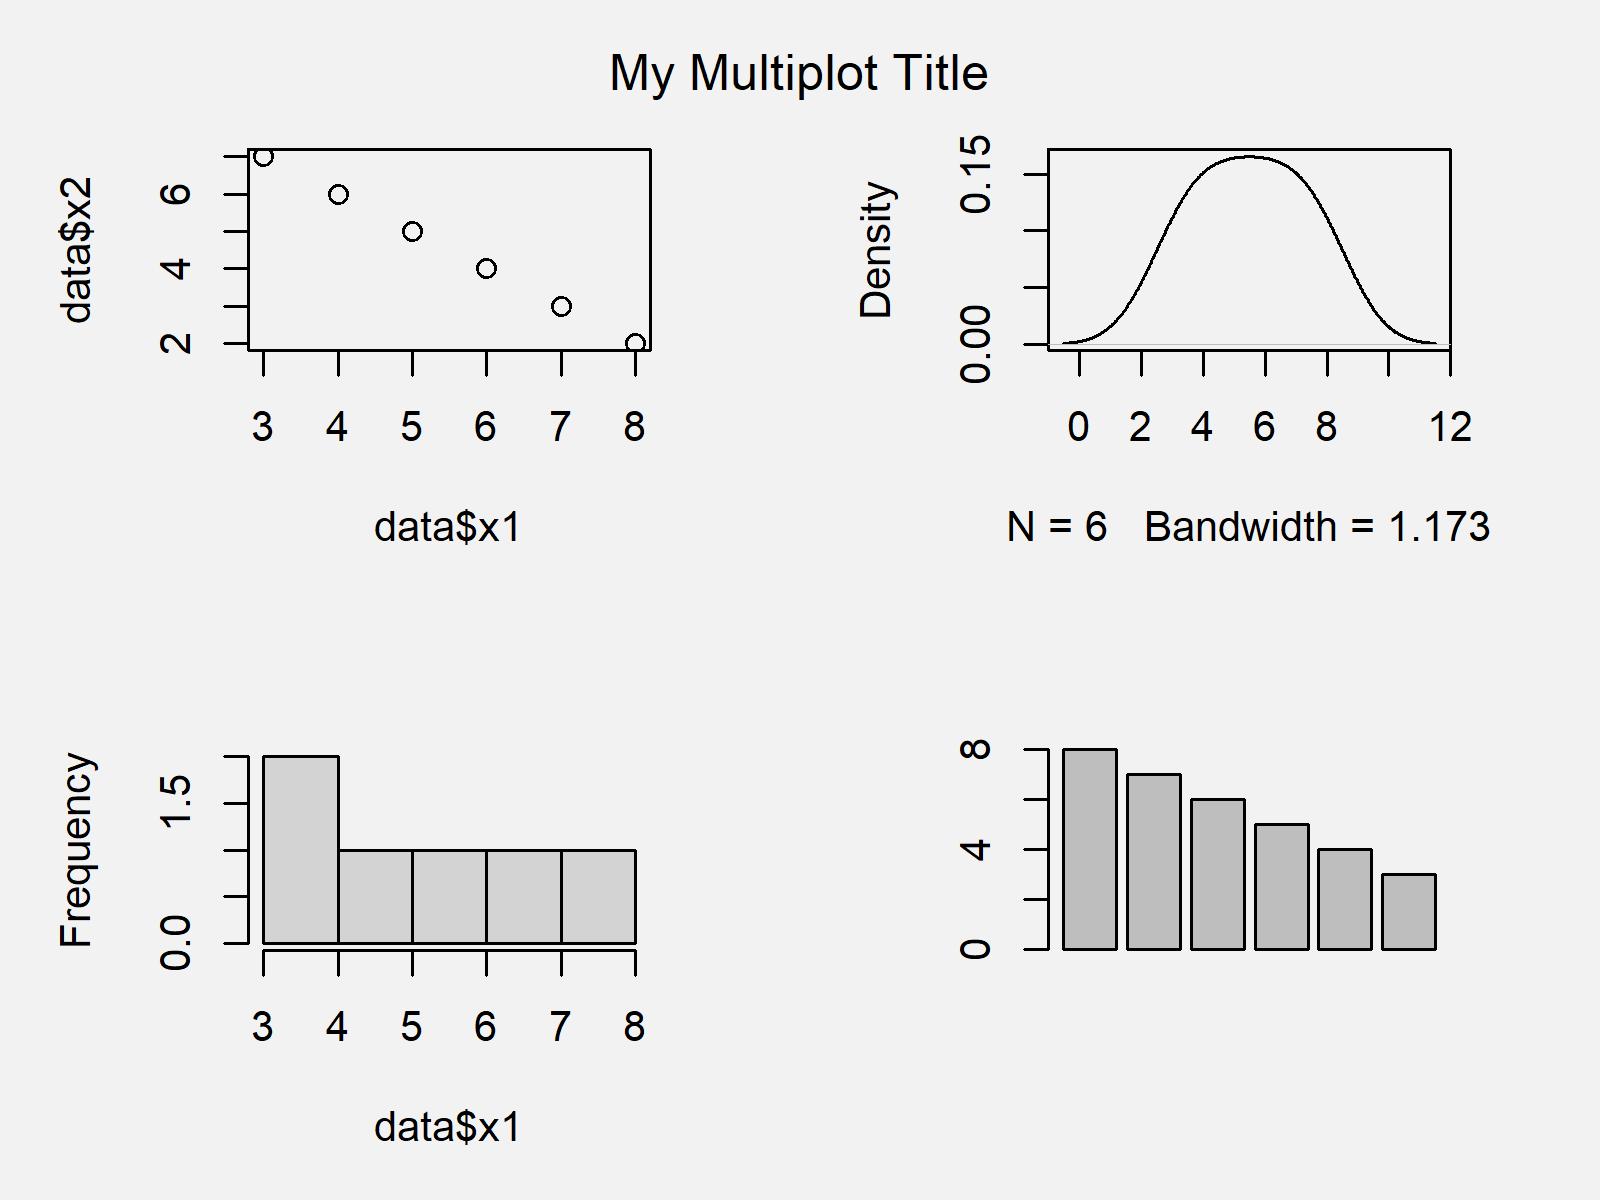 r graph figure 1 common main title for multiple plots r